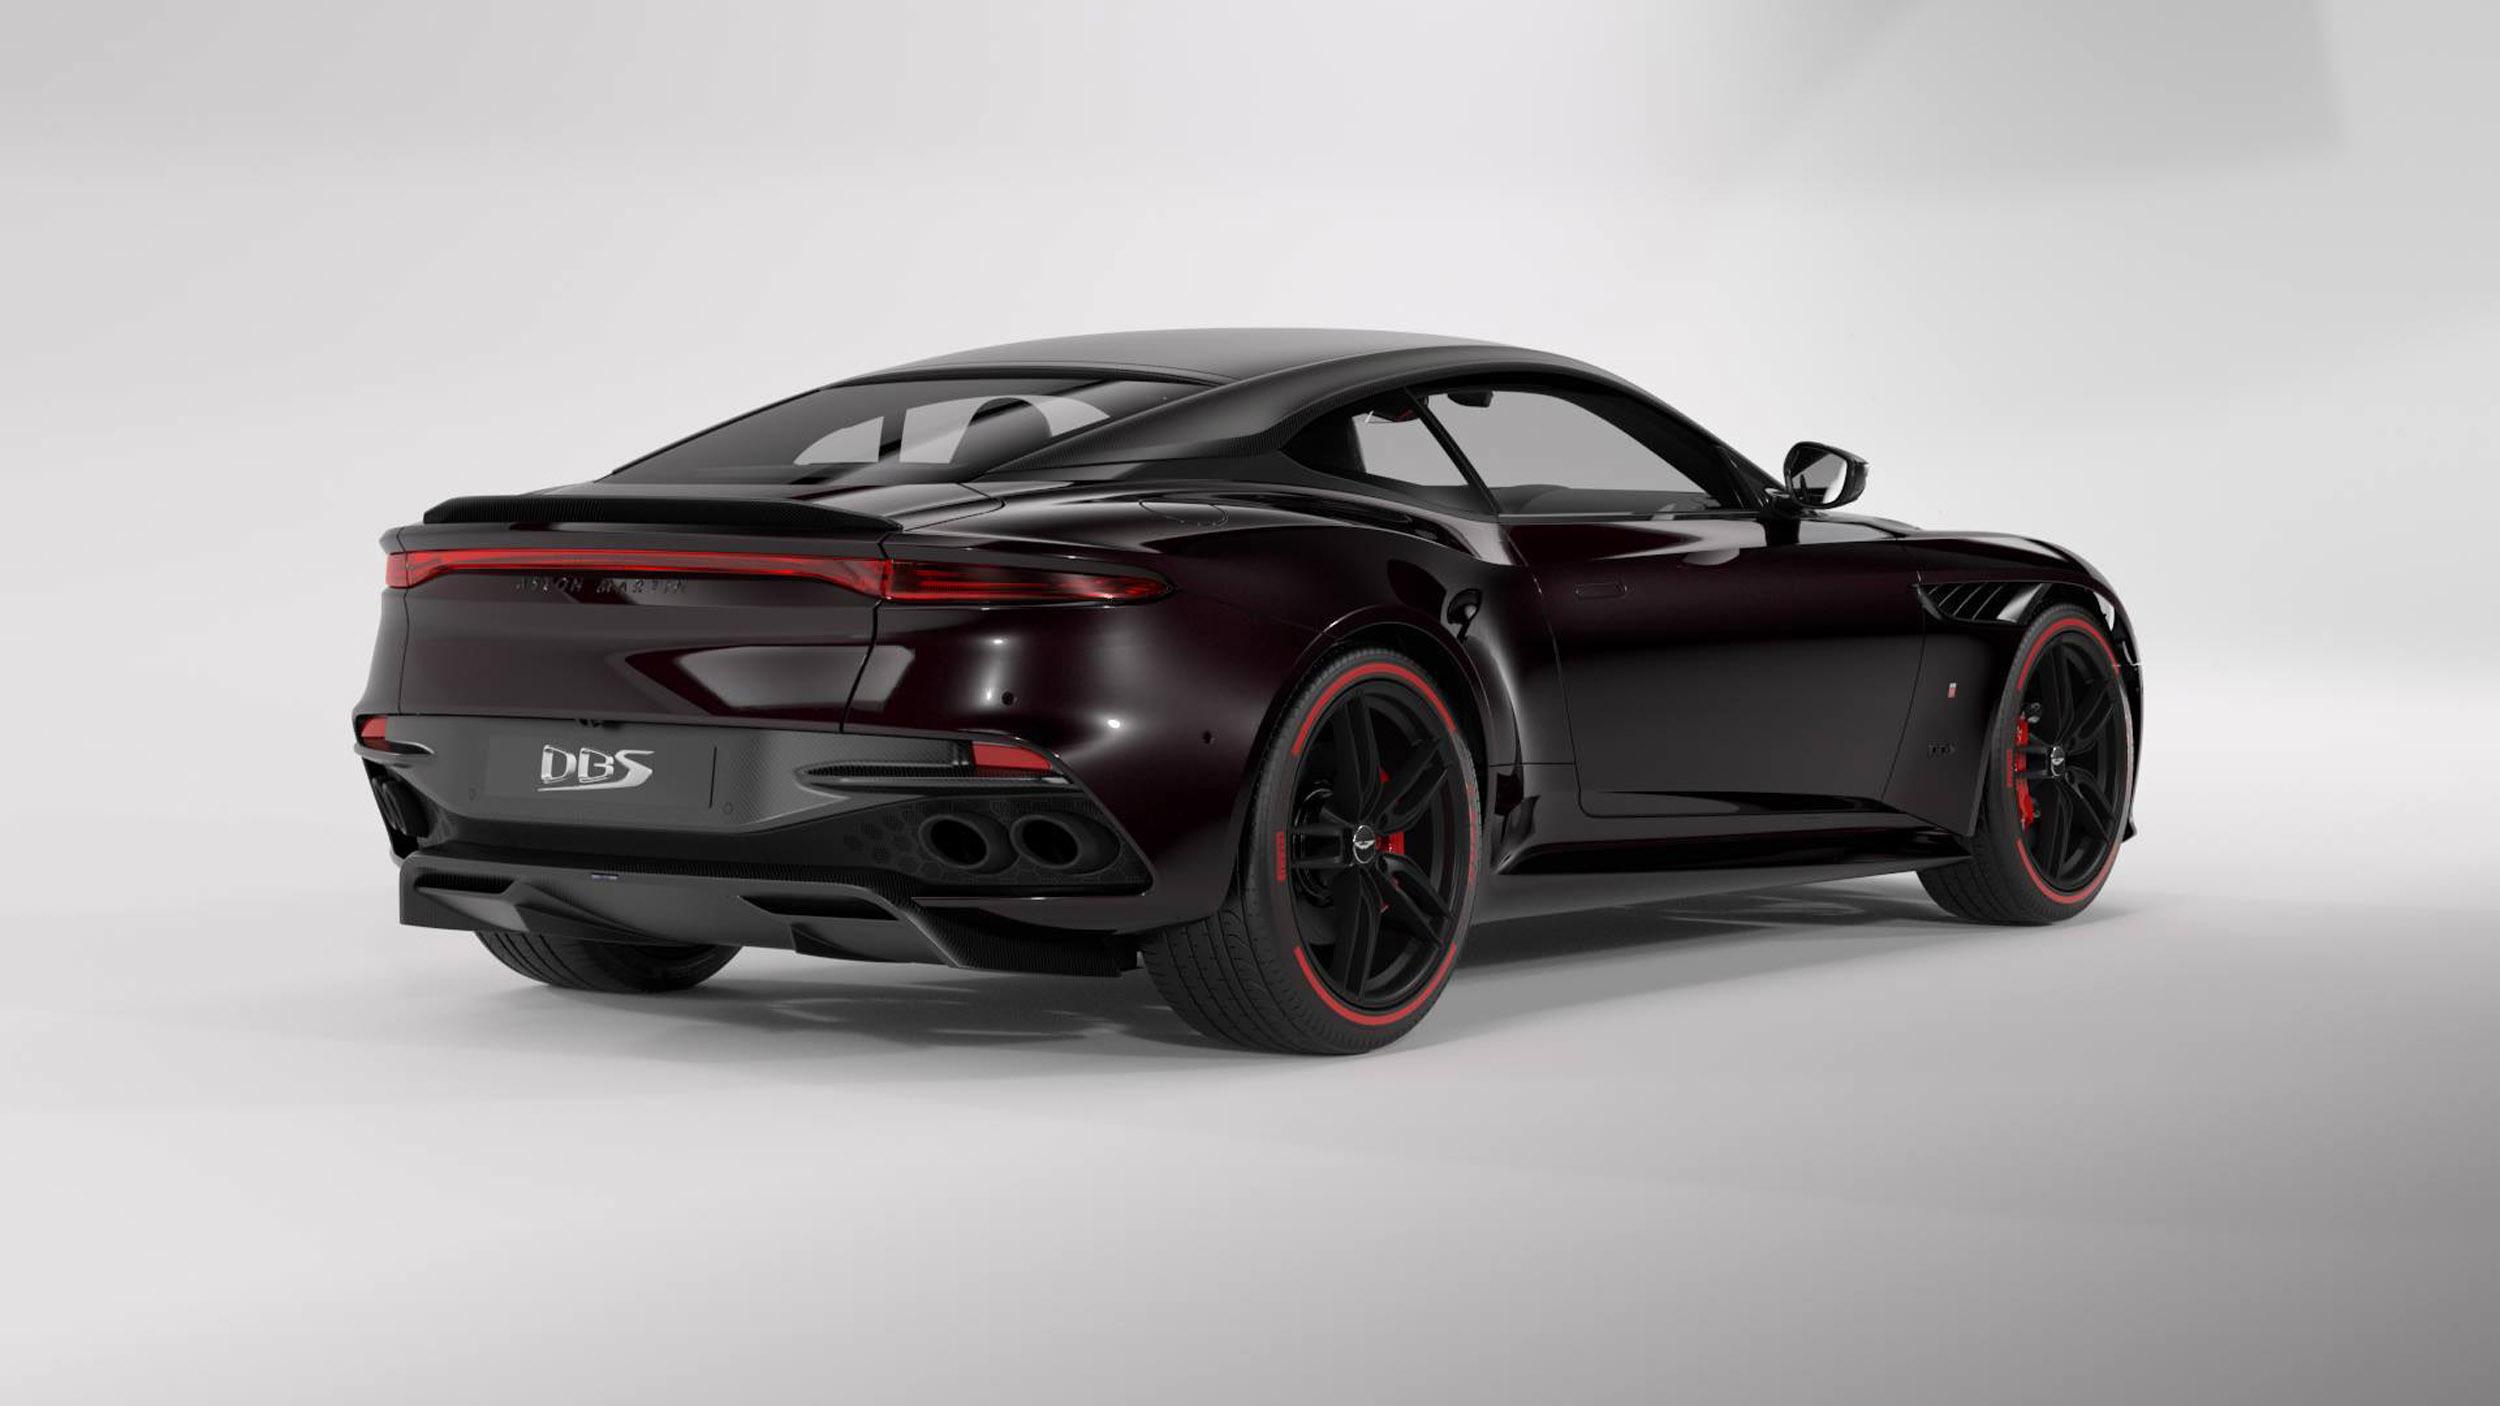 Aston Martin DBS Superleggera Tag Heuer Edition (2)